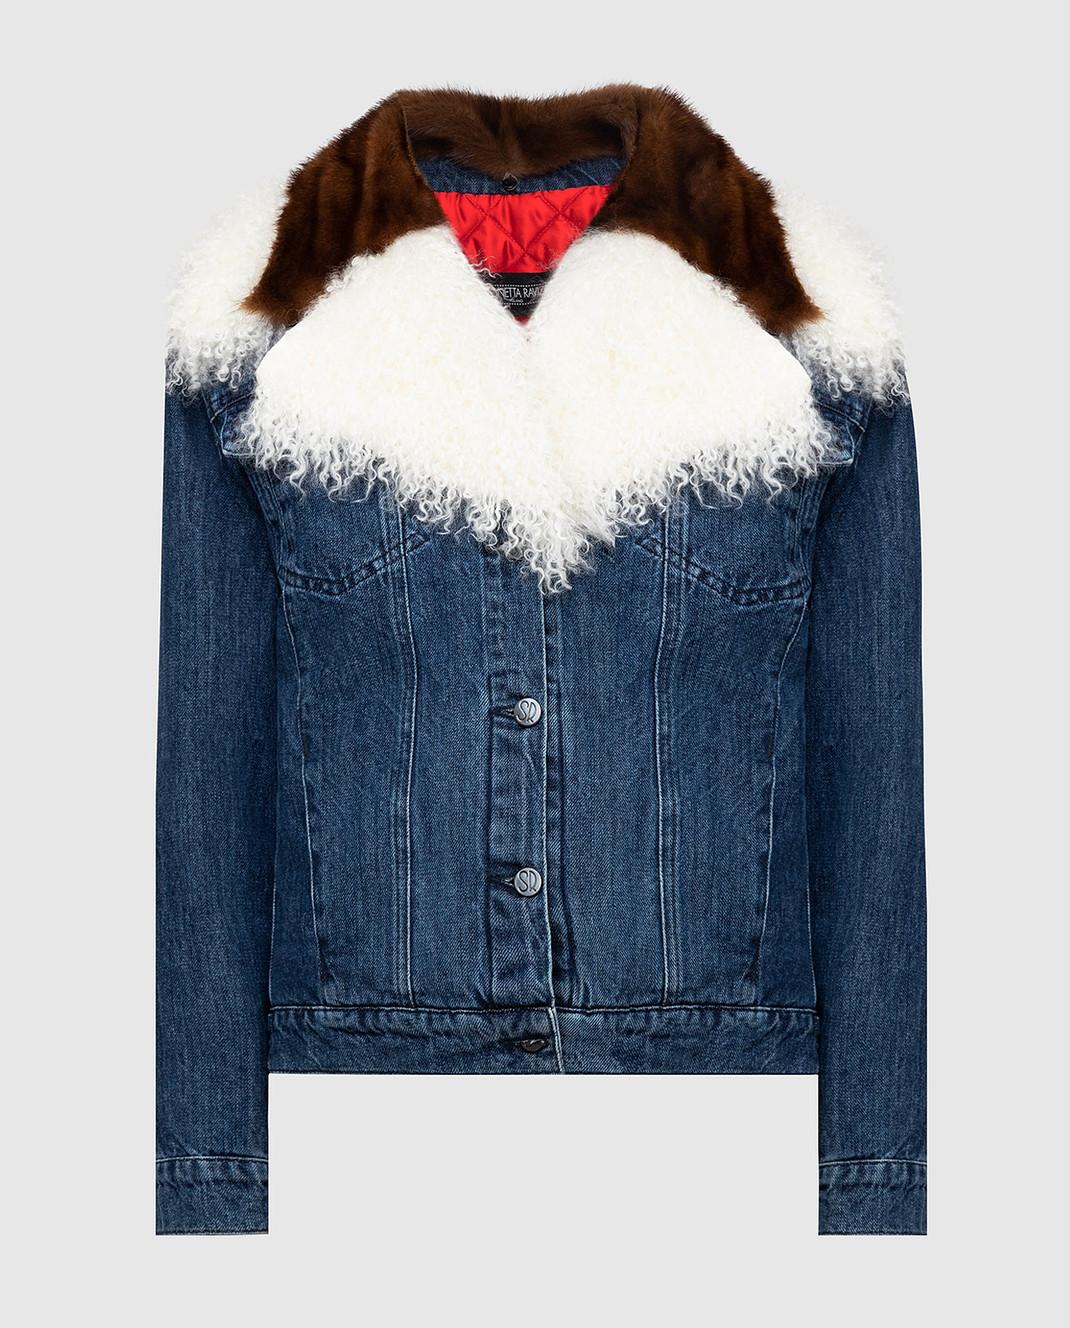 Simonetta Ravizza Синяя джинсовая куртка с мехом норки JALE3